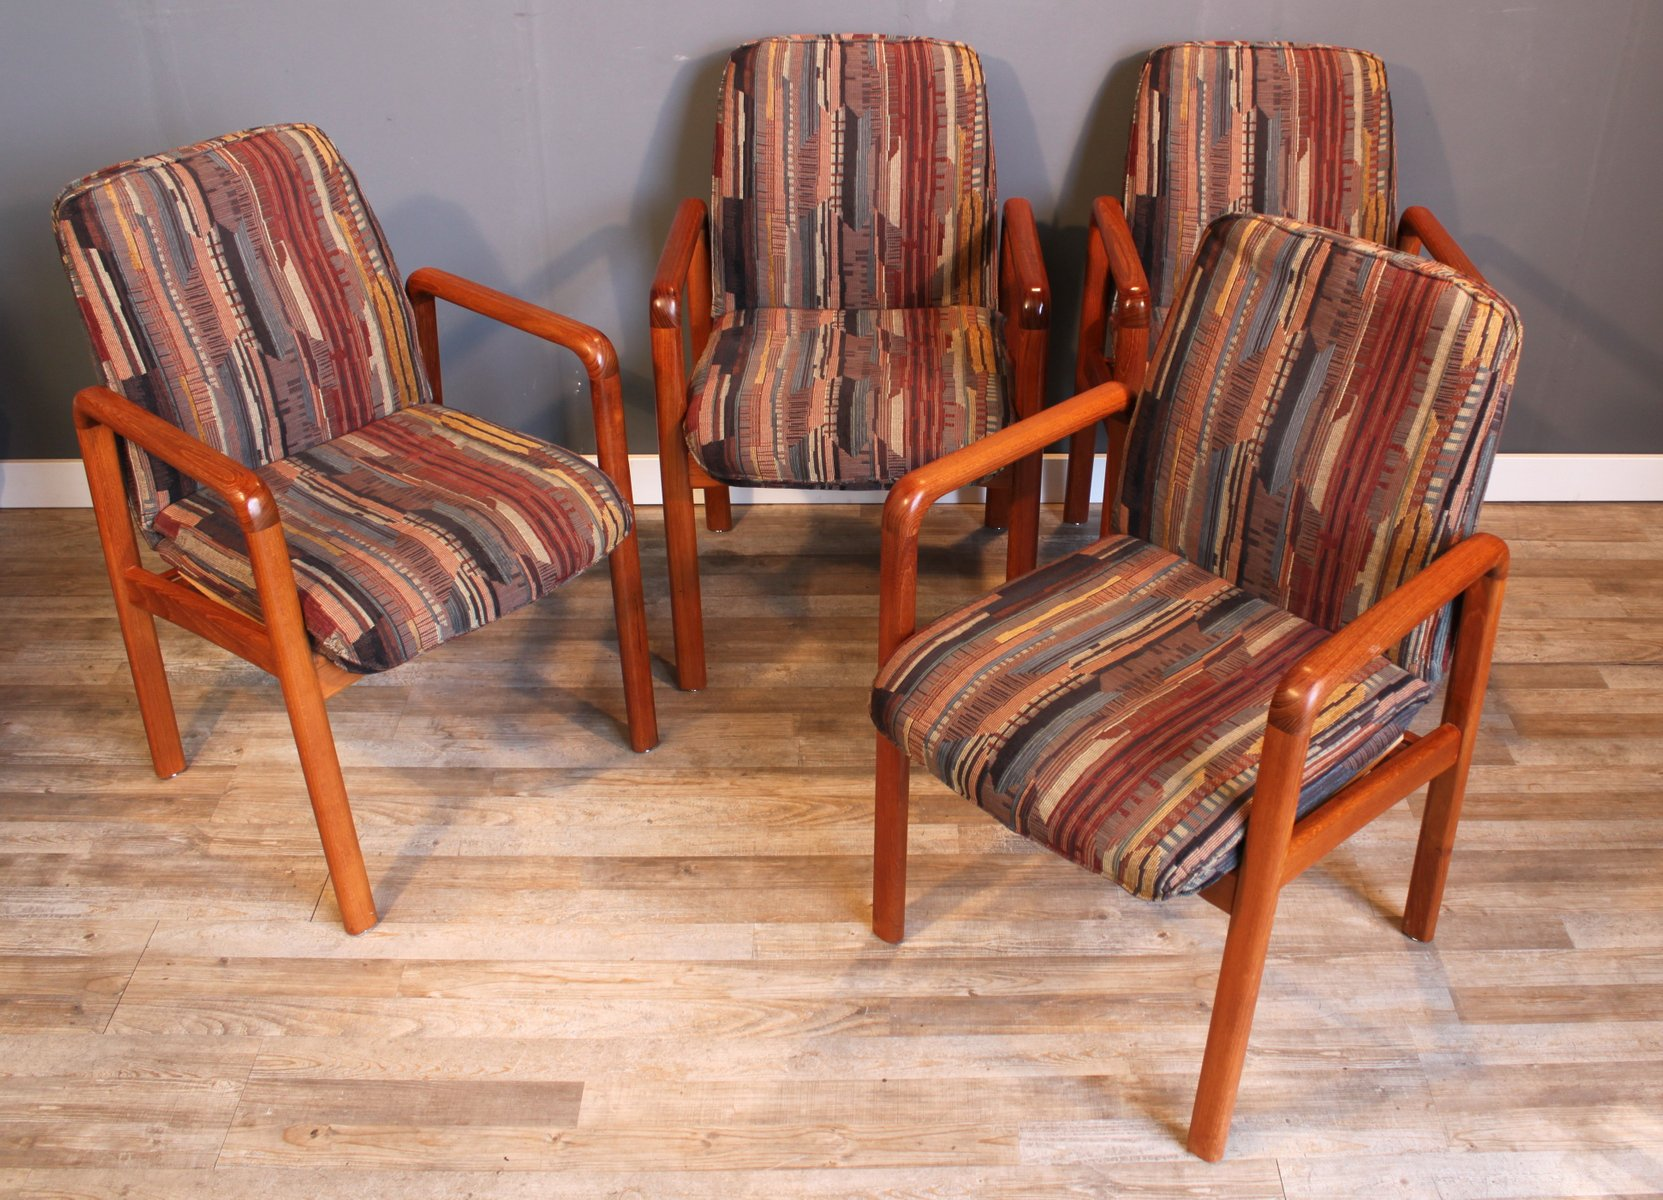 Mid Century Danish Teak Dining Chairs From Dyrlund Set Of 4